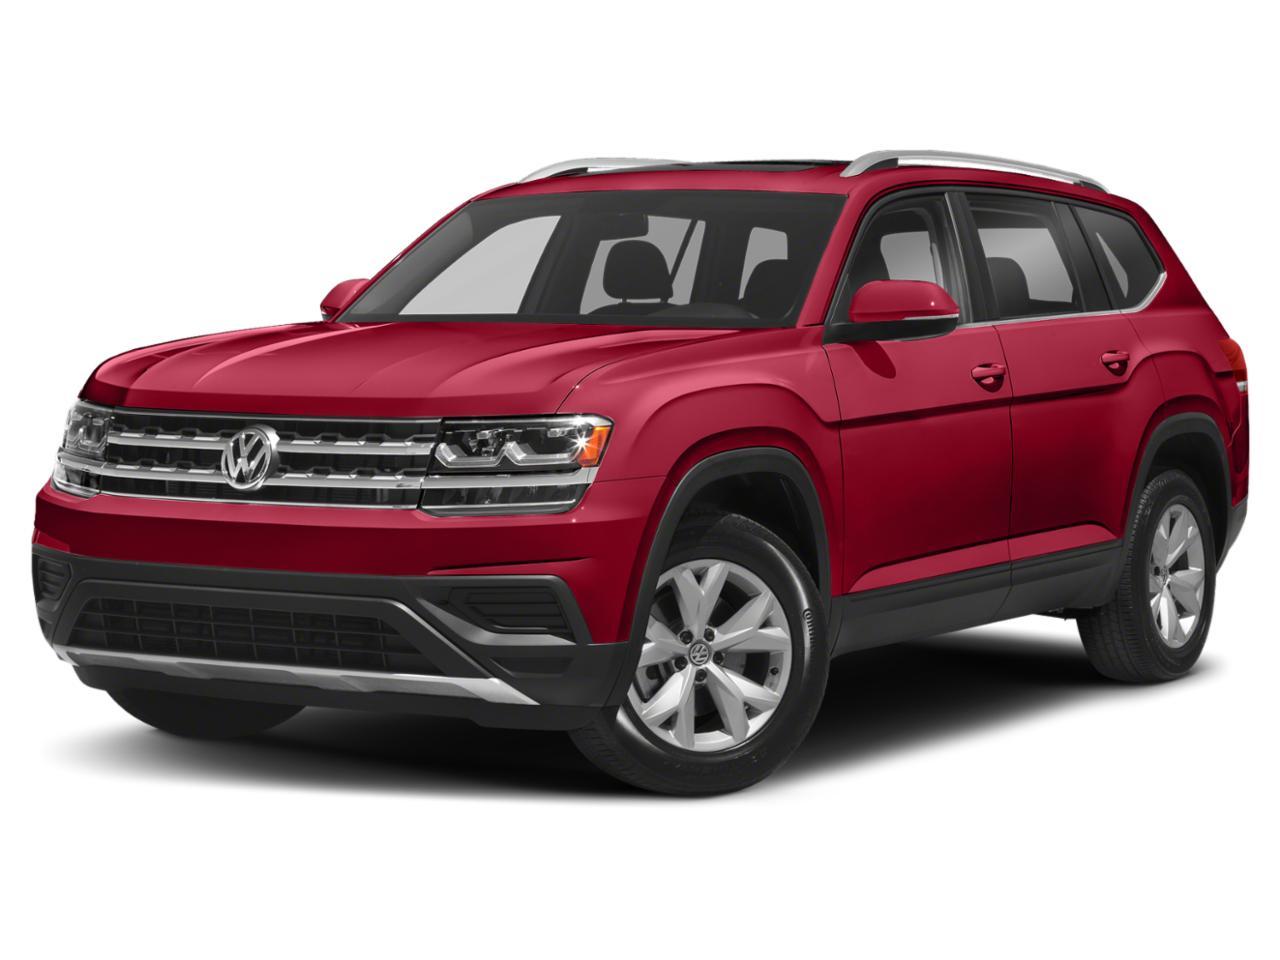 2019 Volkswagen Atlas Vehicle Photo in Oshkosh, WI 54904